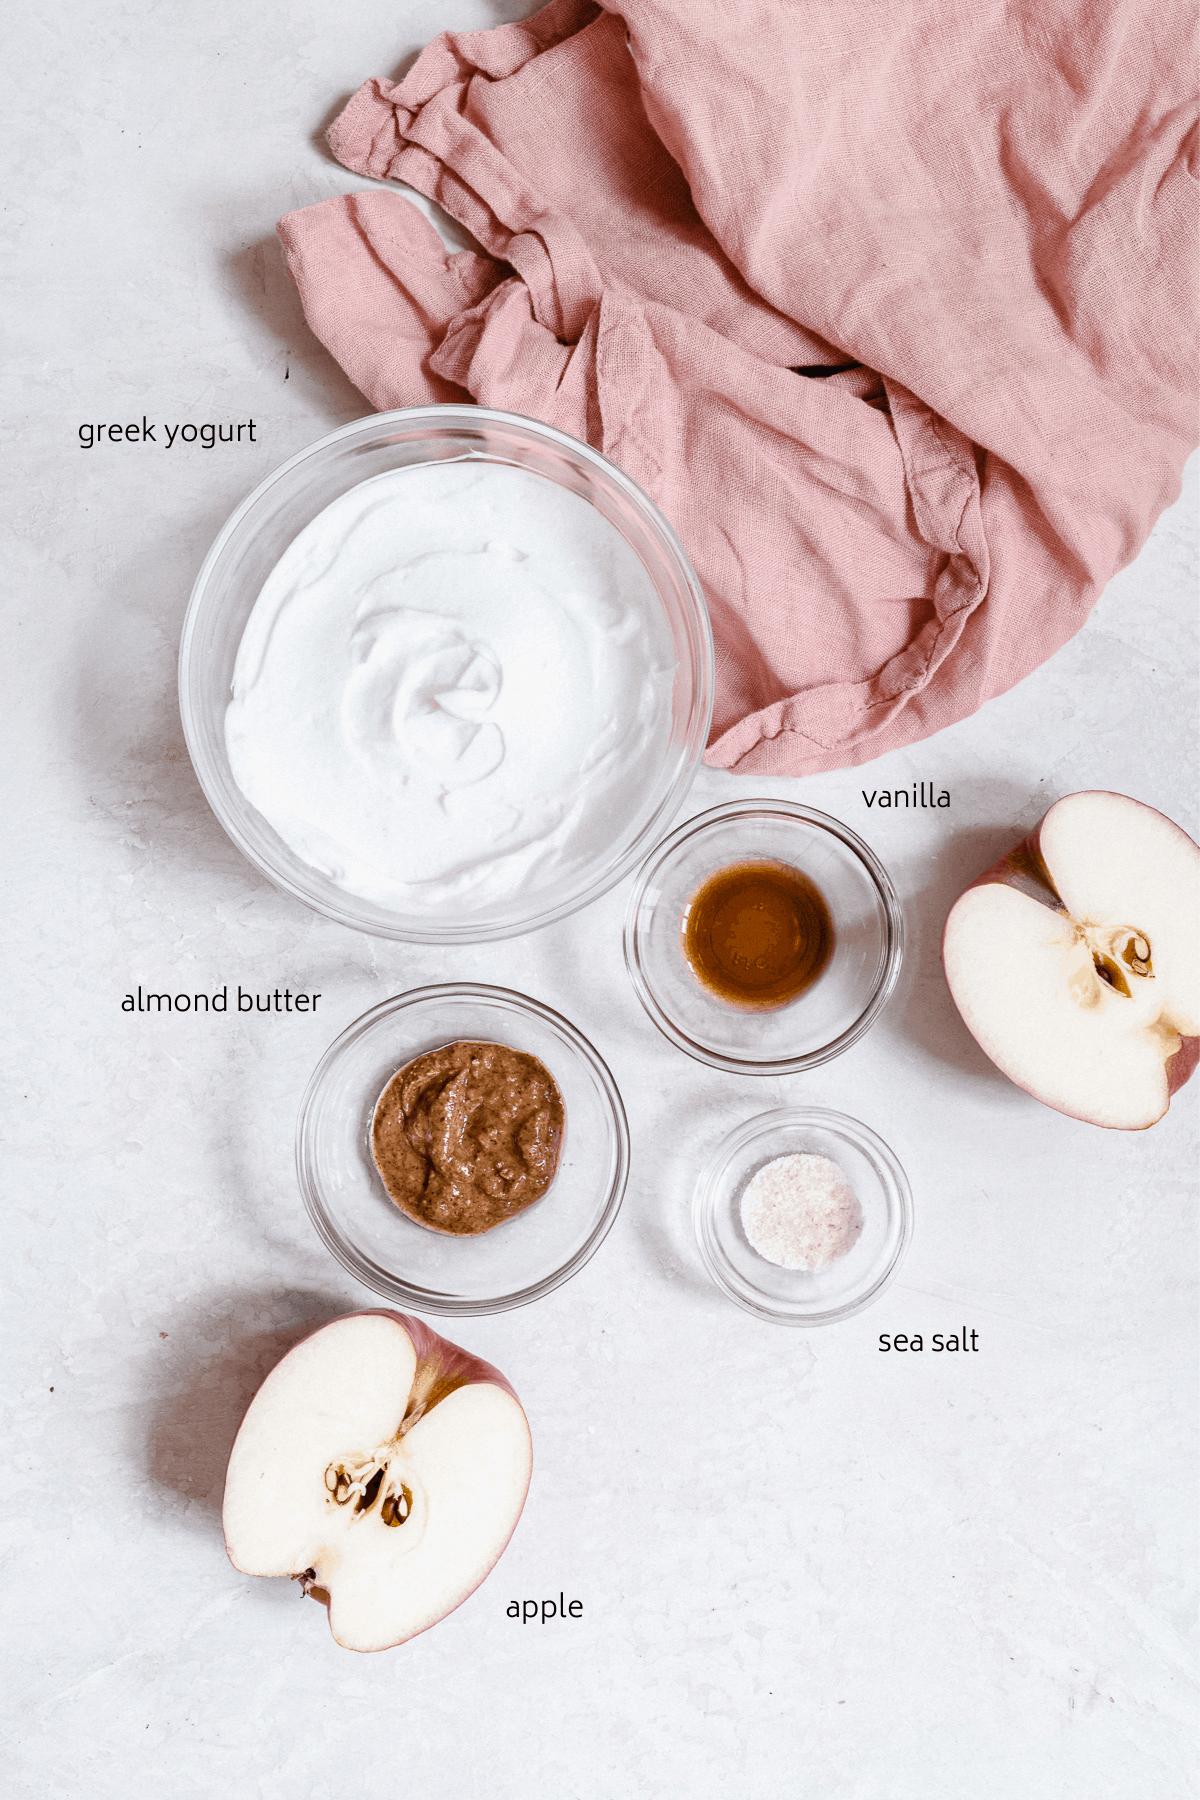 Ingredients for a greek yogurt dip recipe with labels.